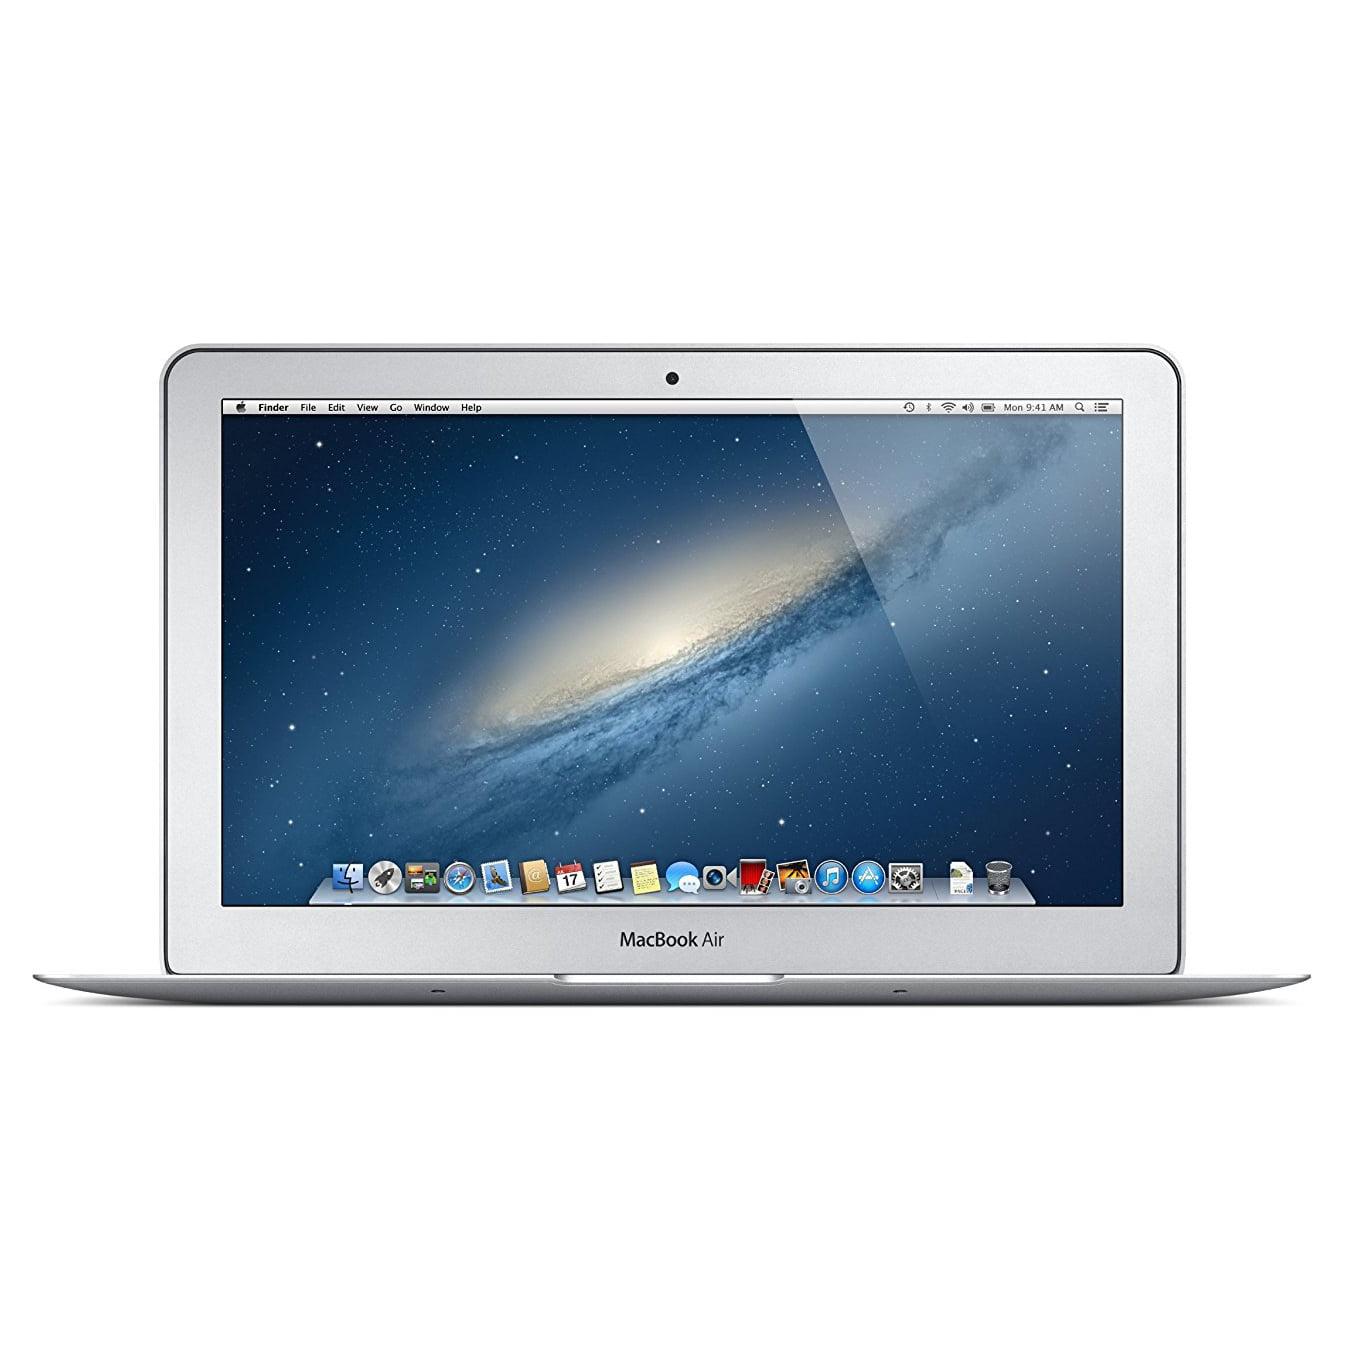 "Refurbished Apple Macbook Air 11.6"" Laptop Intel 1.3GHz i5-4250U 8GB 256GB SSD - MD712LLA"